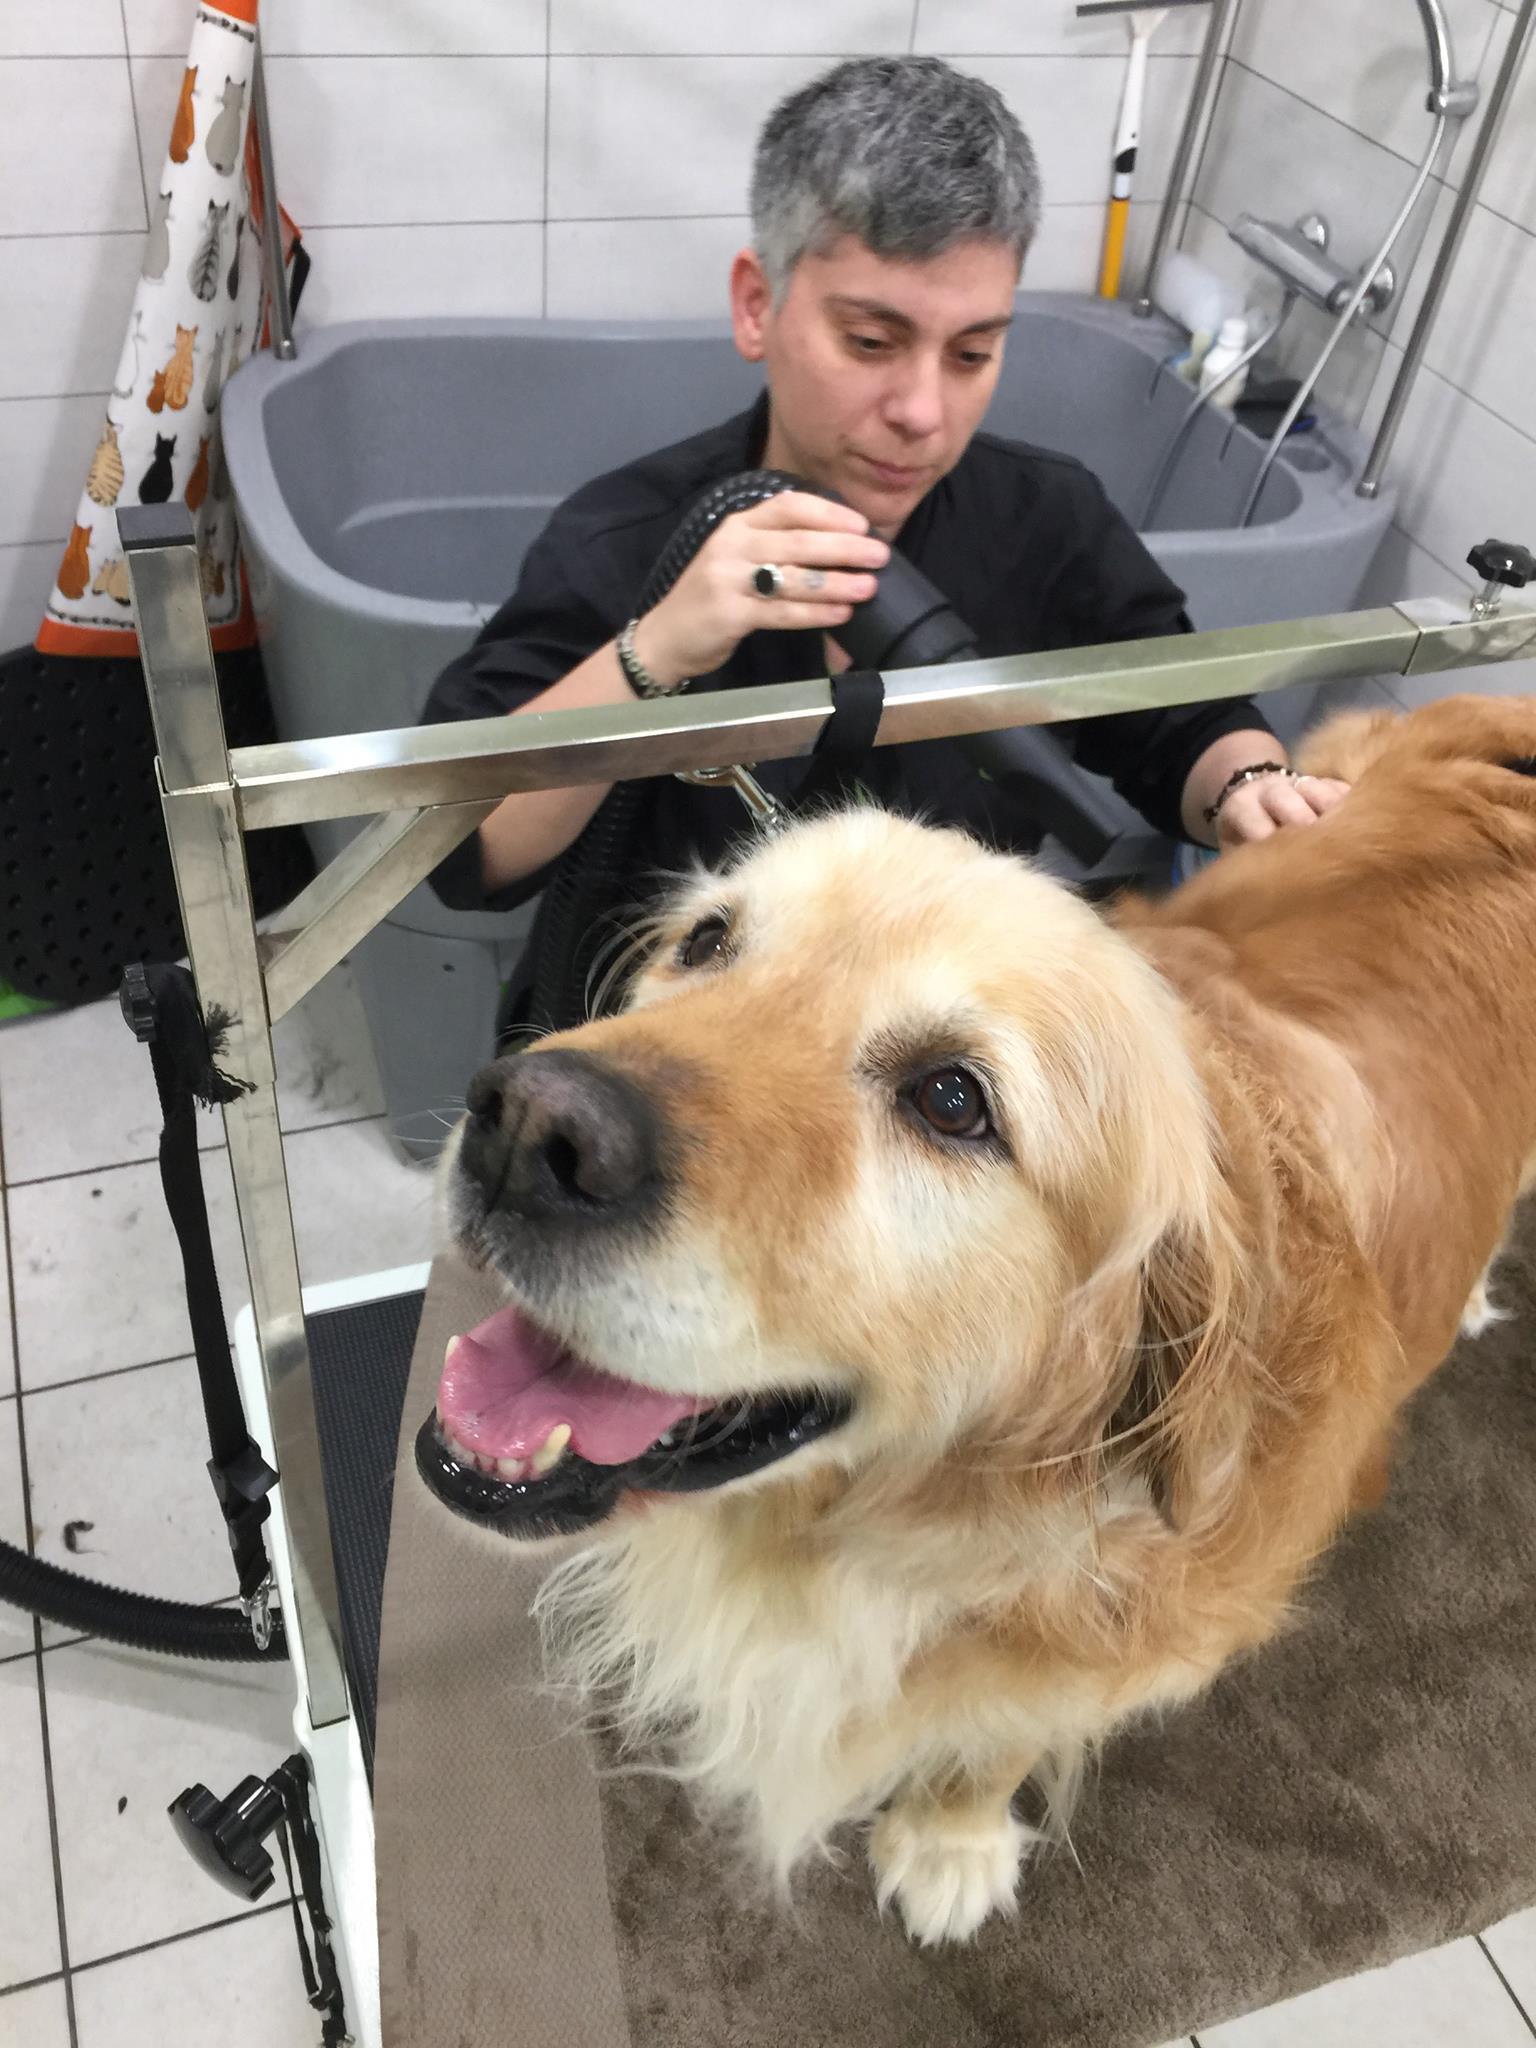 Golden-Retriever-καλλωπισμός-σκύλου-αθήνα.jpg